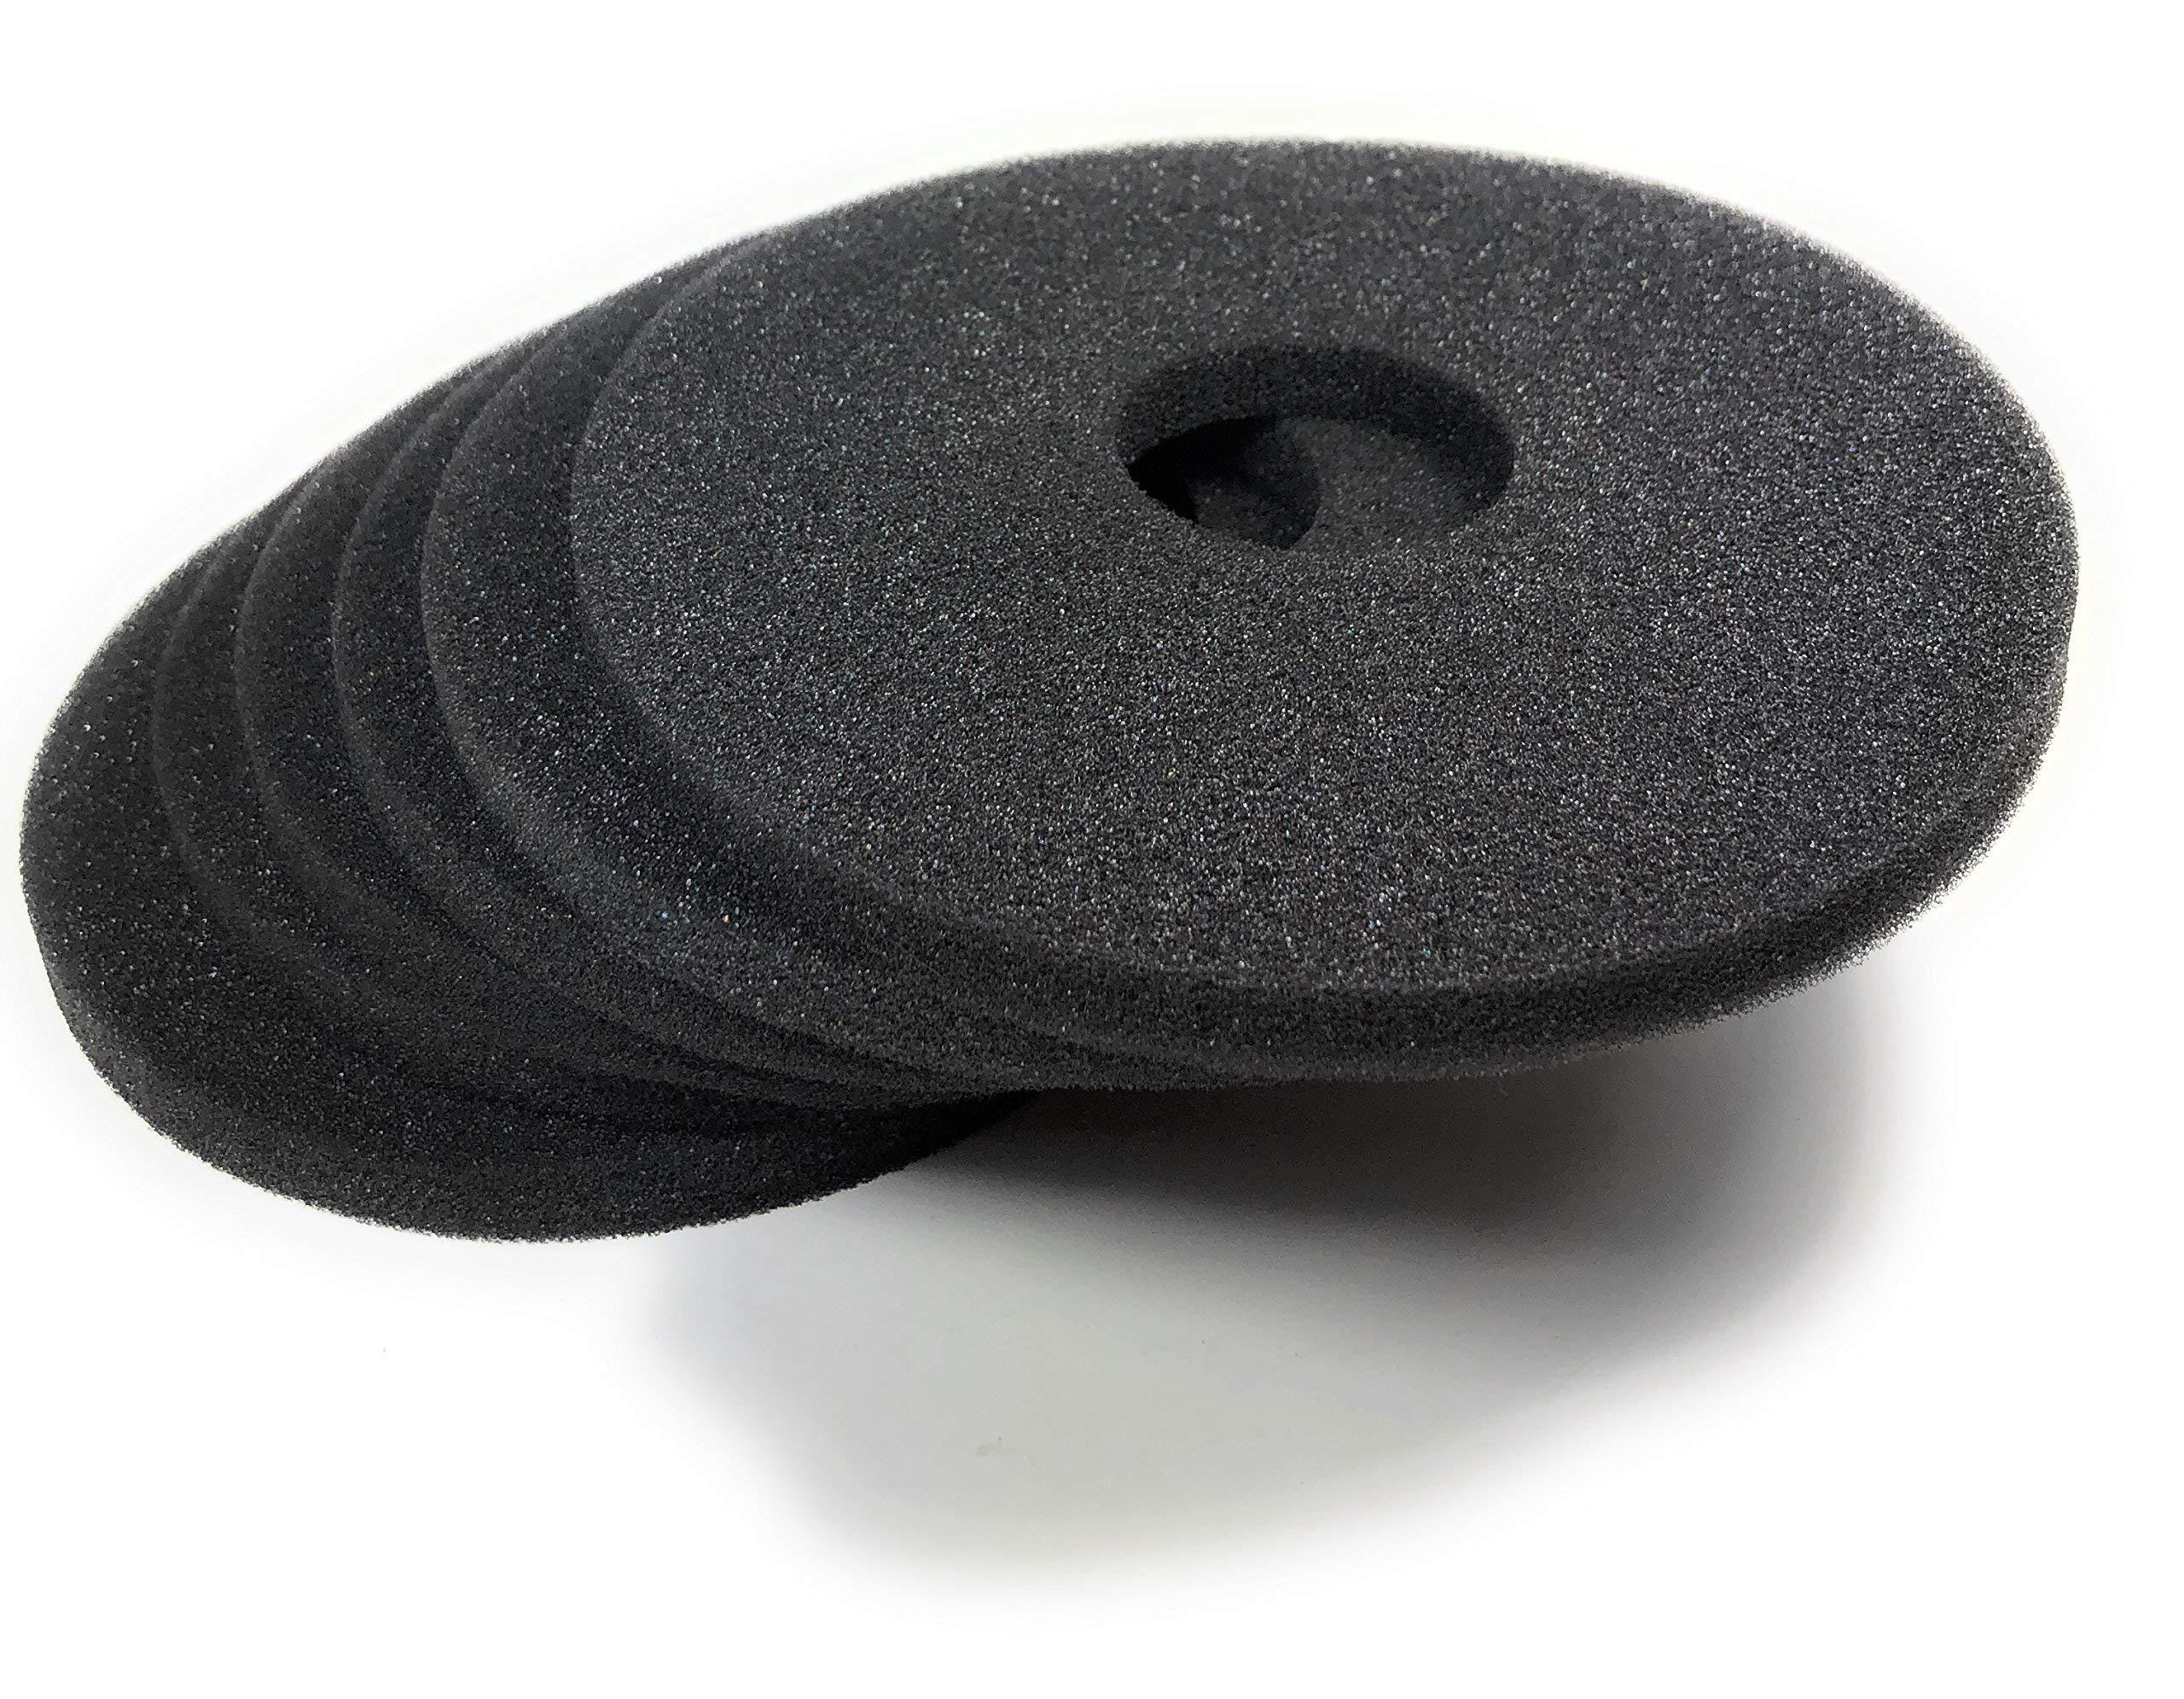 Margarita Salt Glass Bar Rimmer Replacement Sponges Set of 6, Black by SUMMIT Salt Rimmer Replacement Sponges (Image #3)